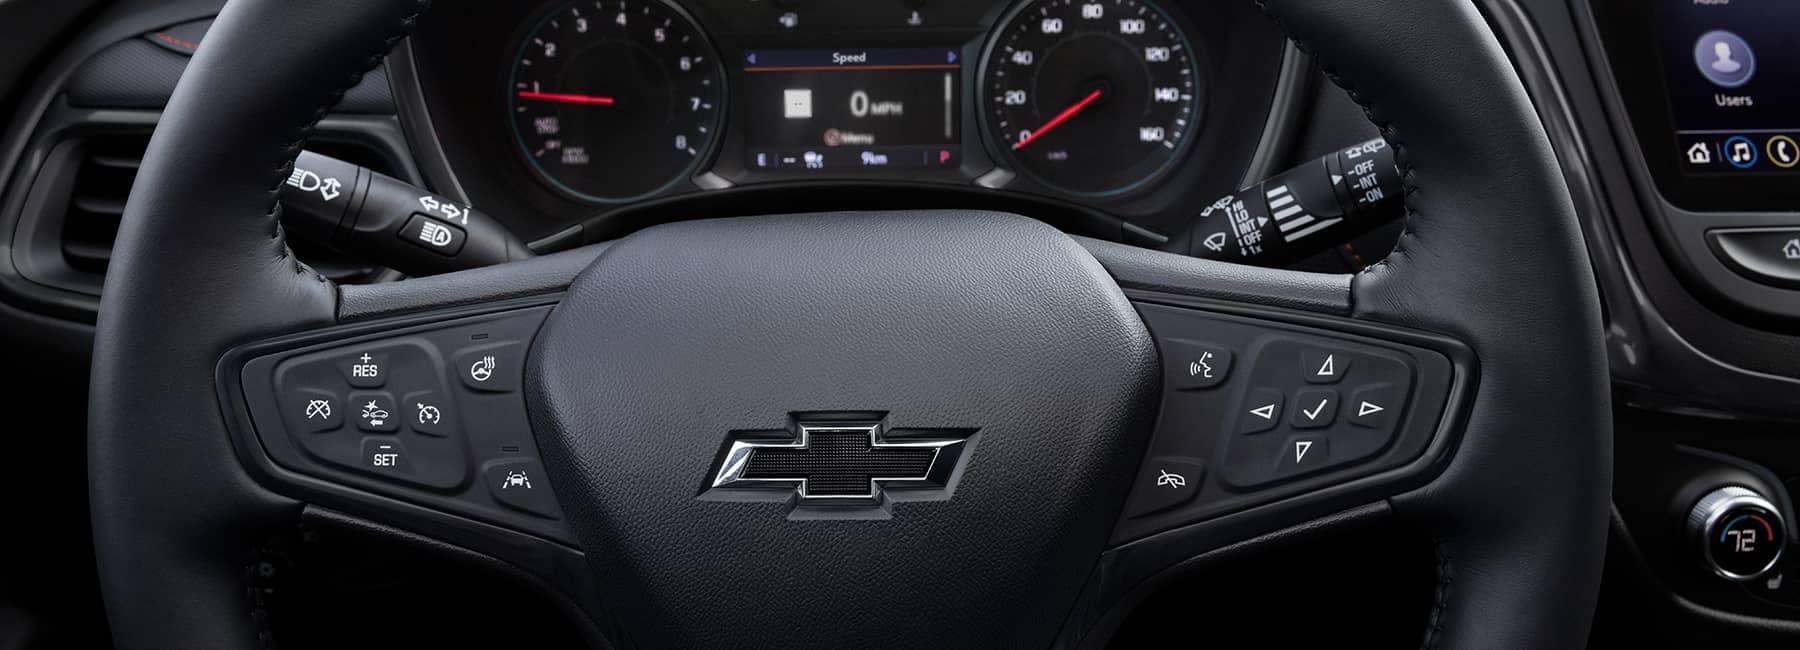 2021 Chevrolet Equinox Steering Wheel